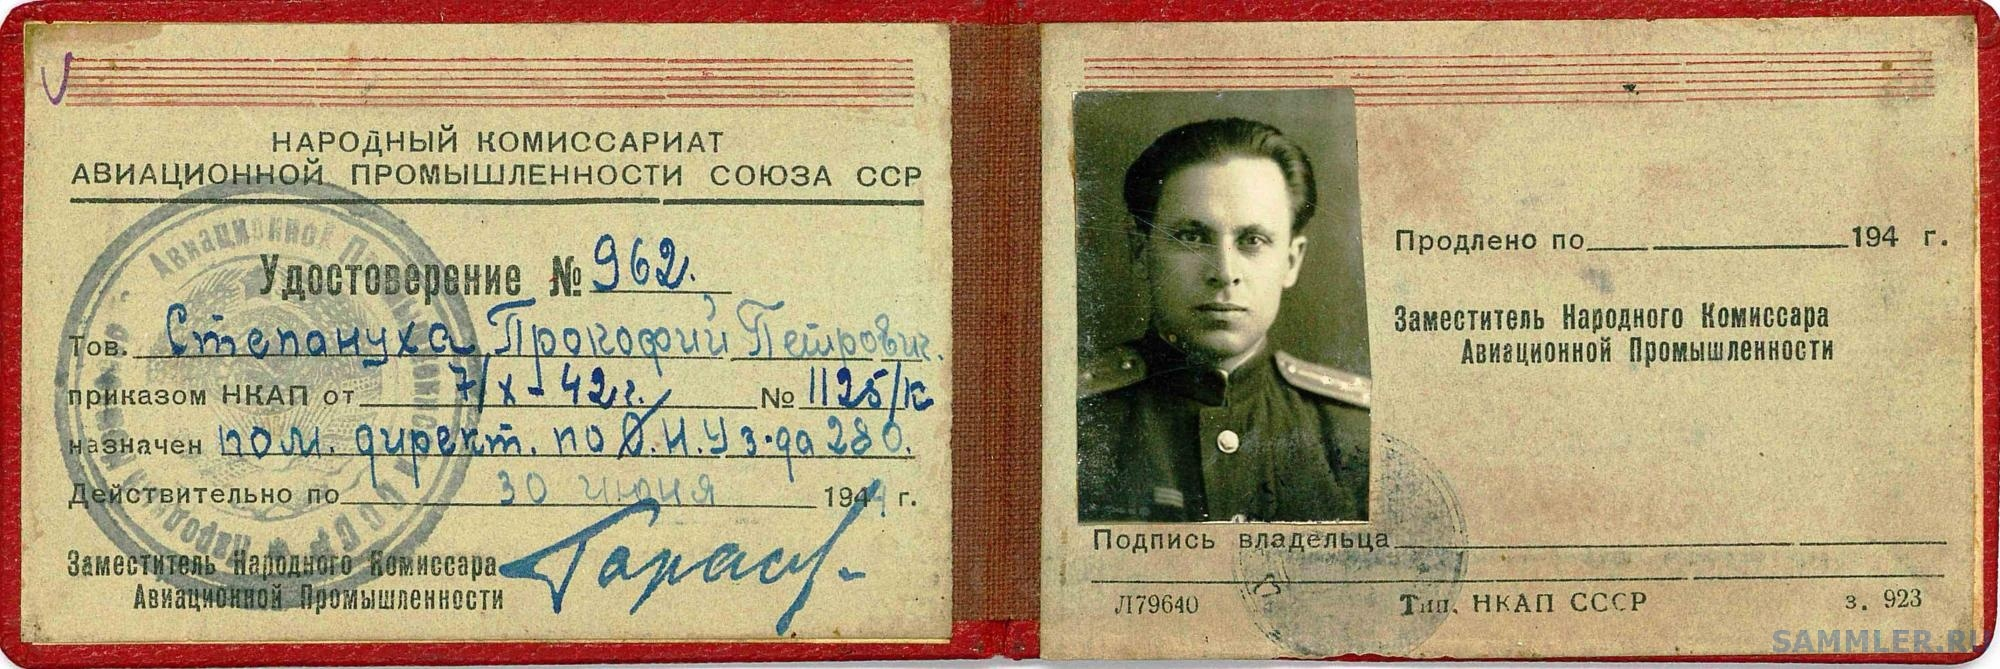 Удостоверение НКАП СССР N962 Степануха Прокофий Петрович-2.jpg